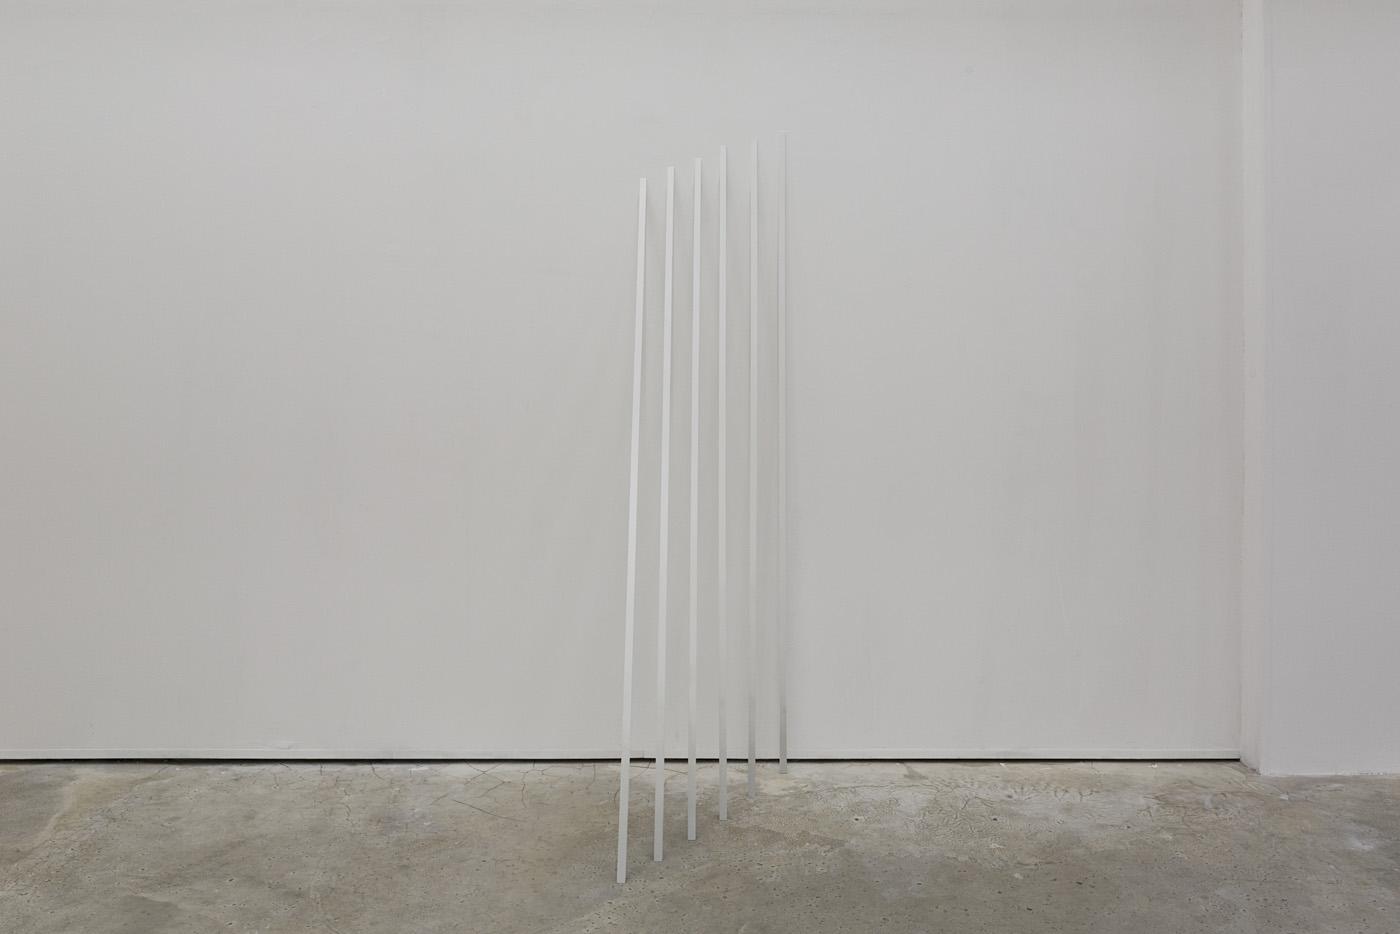 Abscissa linea, 2013 - Bois, acrylique